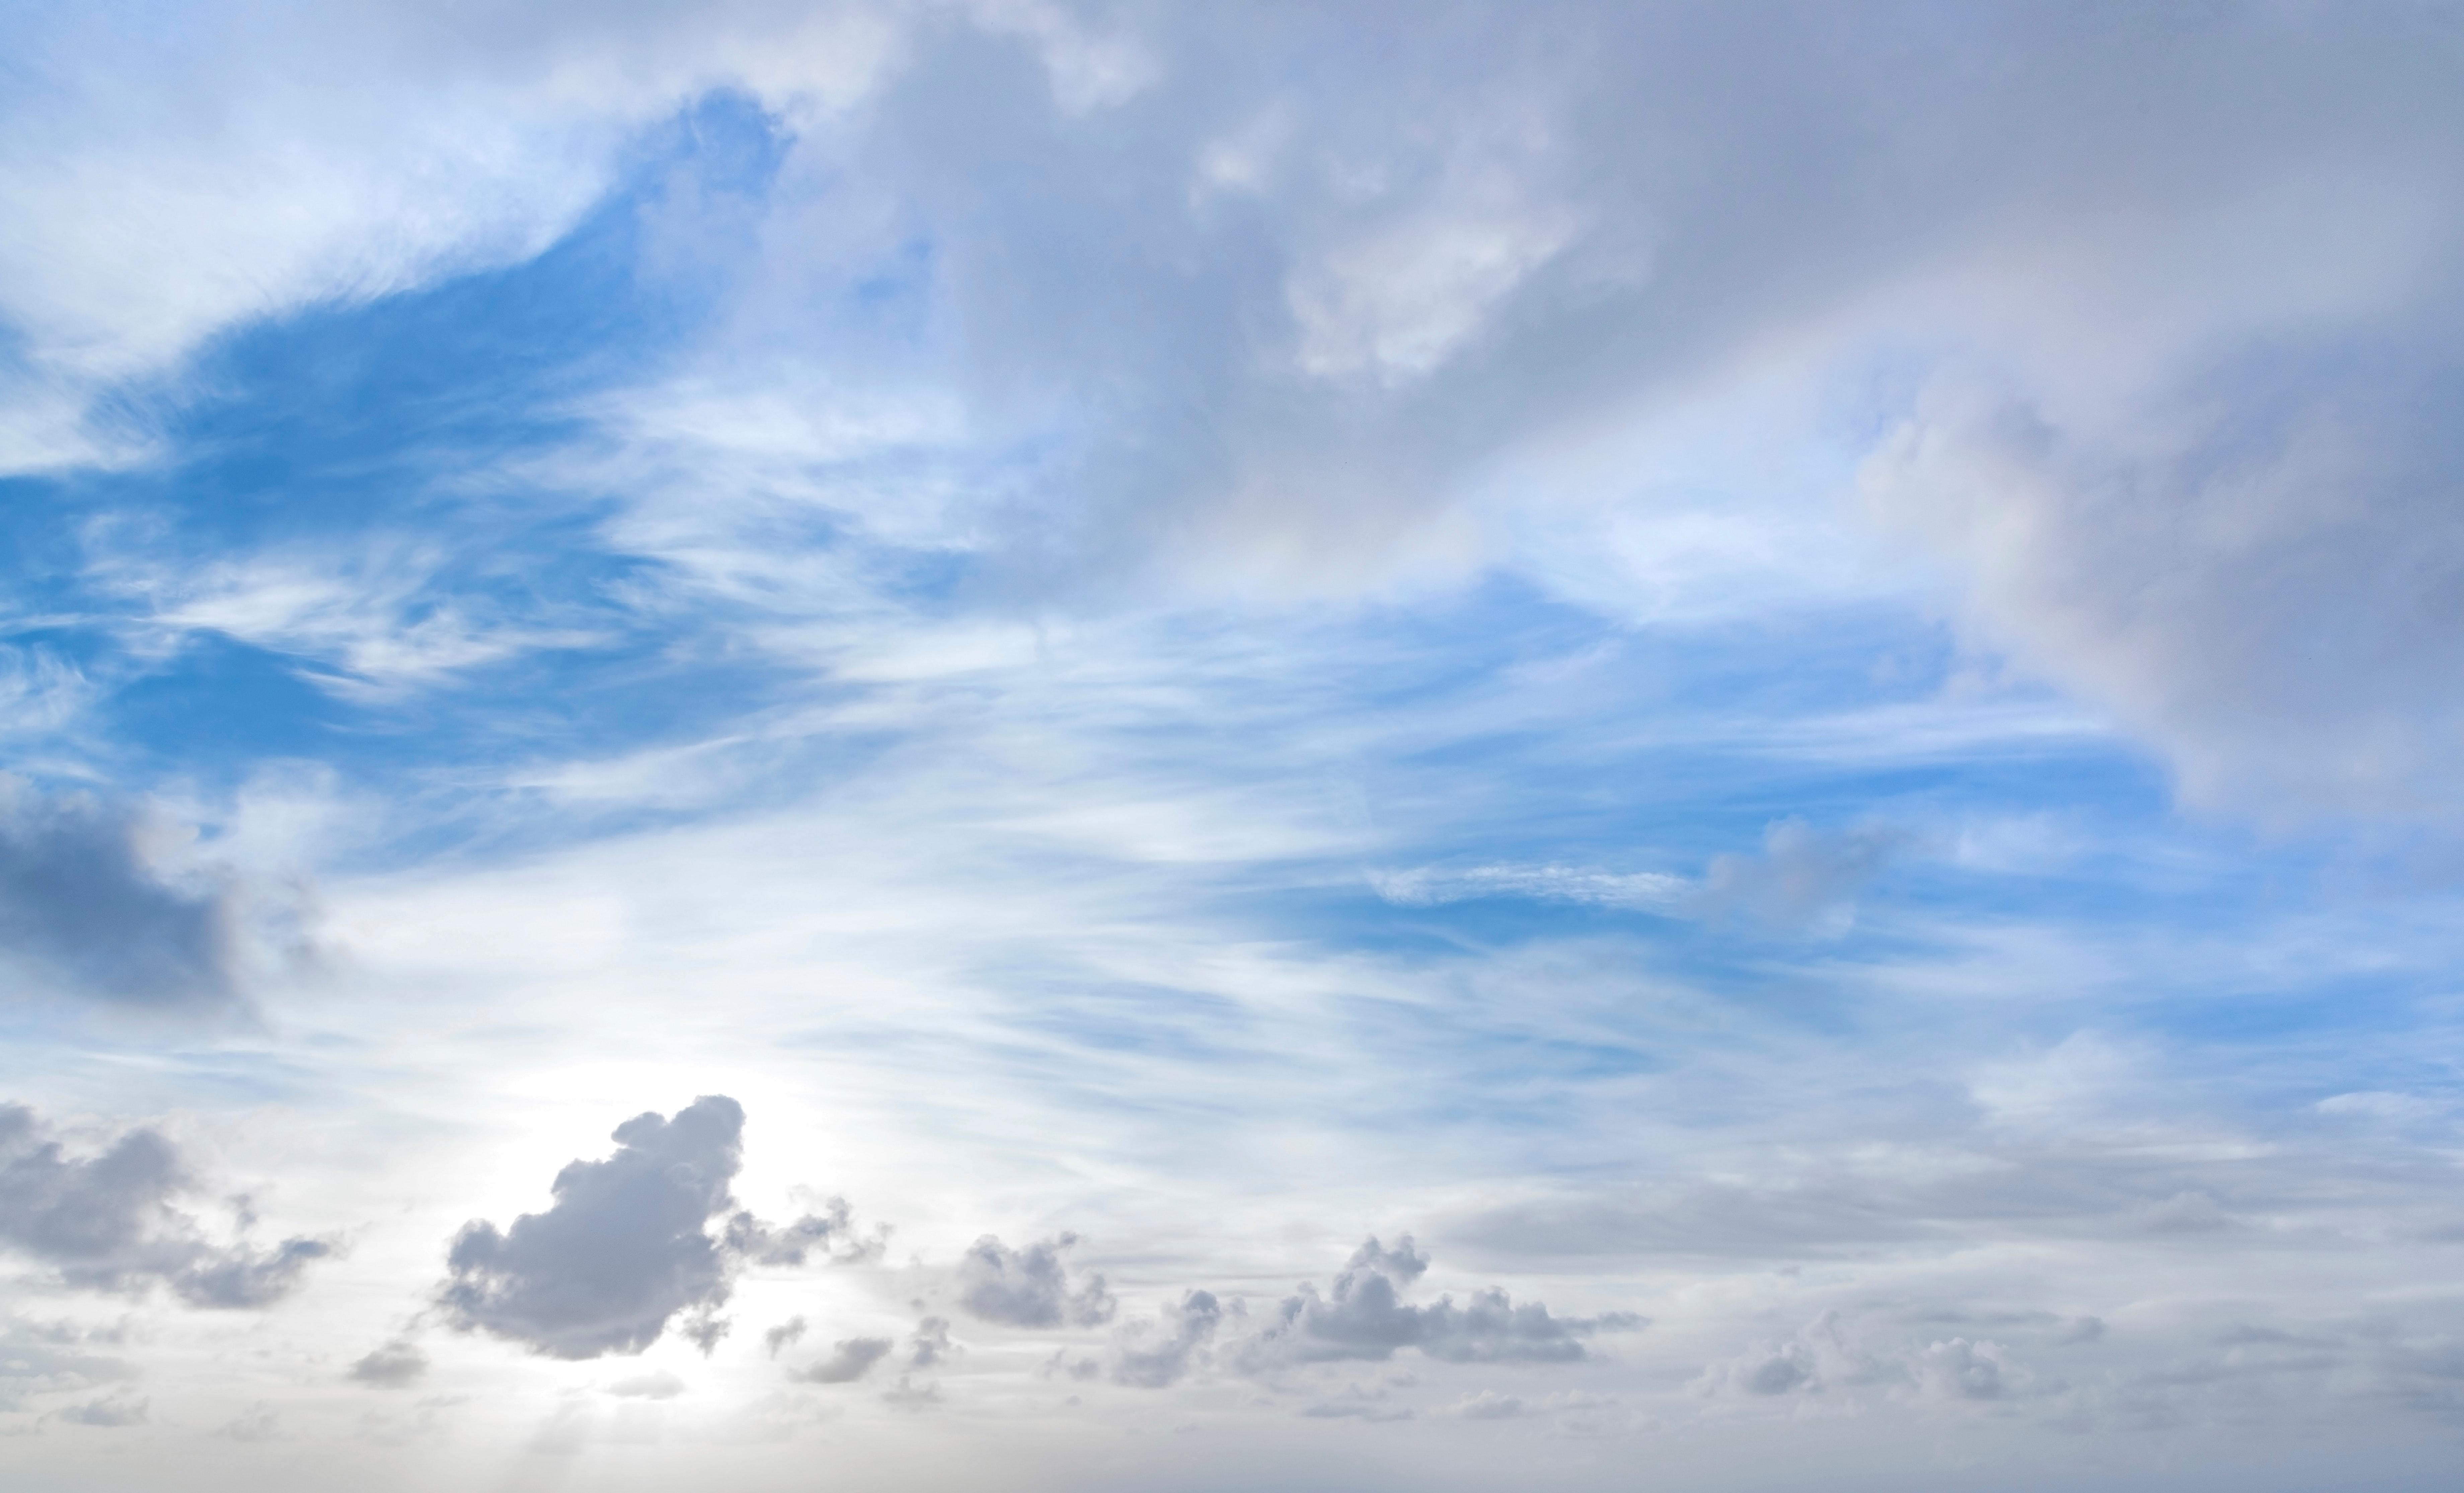 Cloudy Sky Free Stock Photo